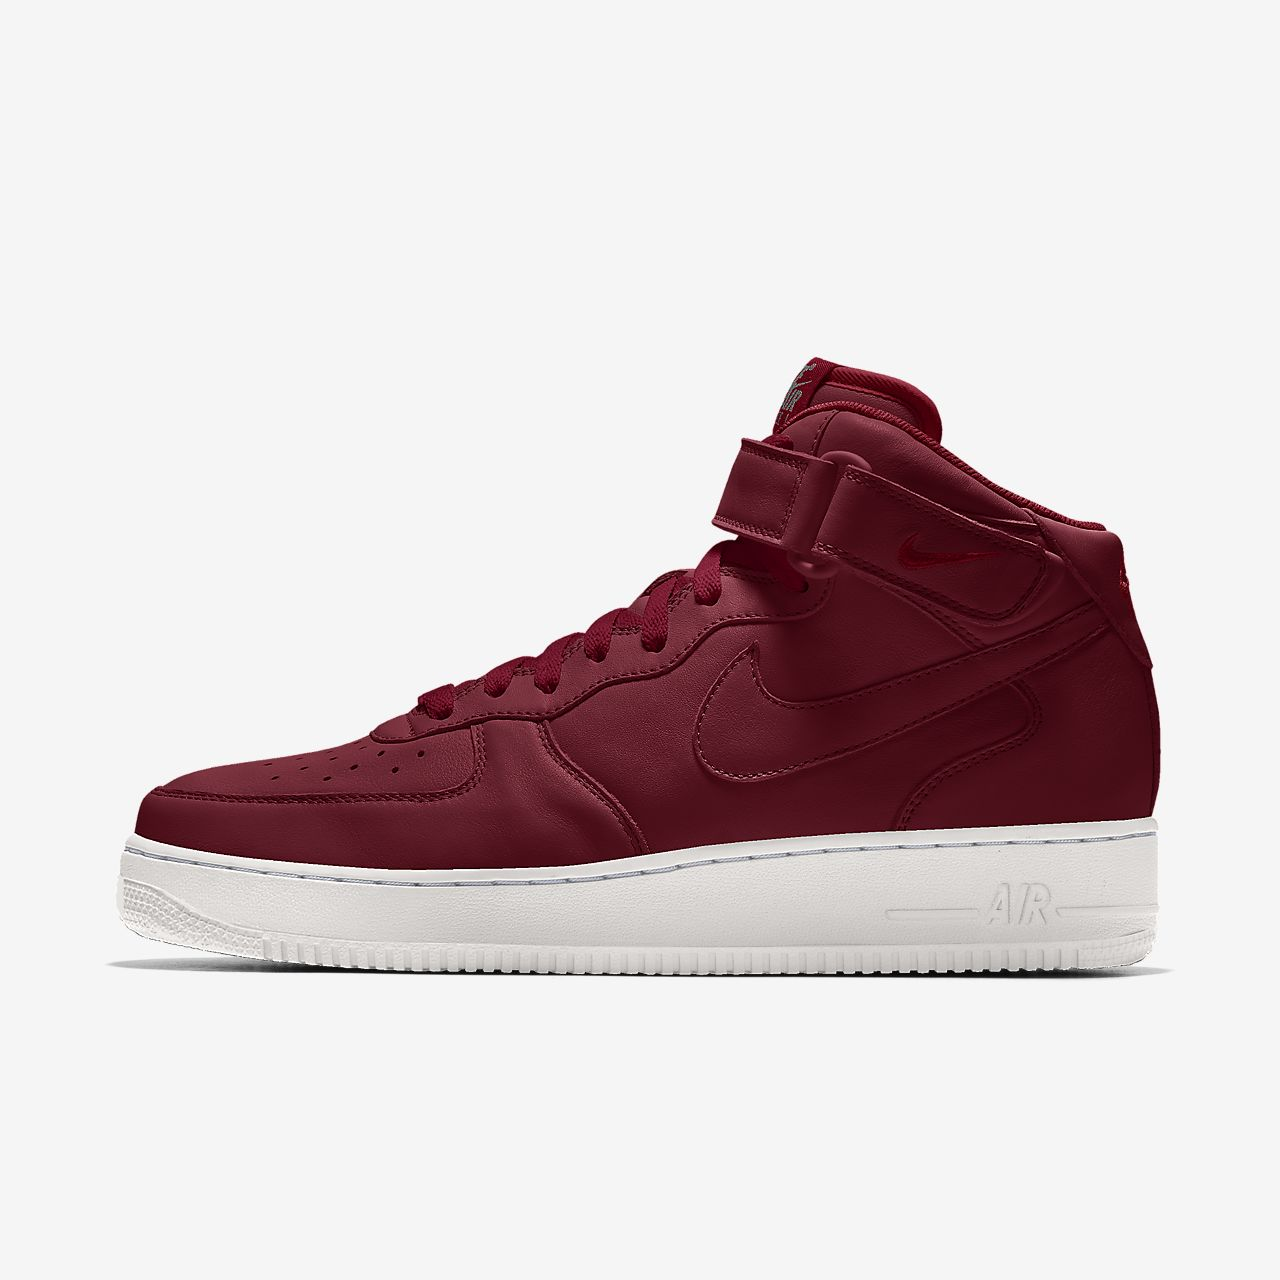 Specialdesignad sko Nike Air Force 1 Mid By You för män